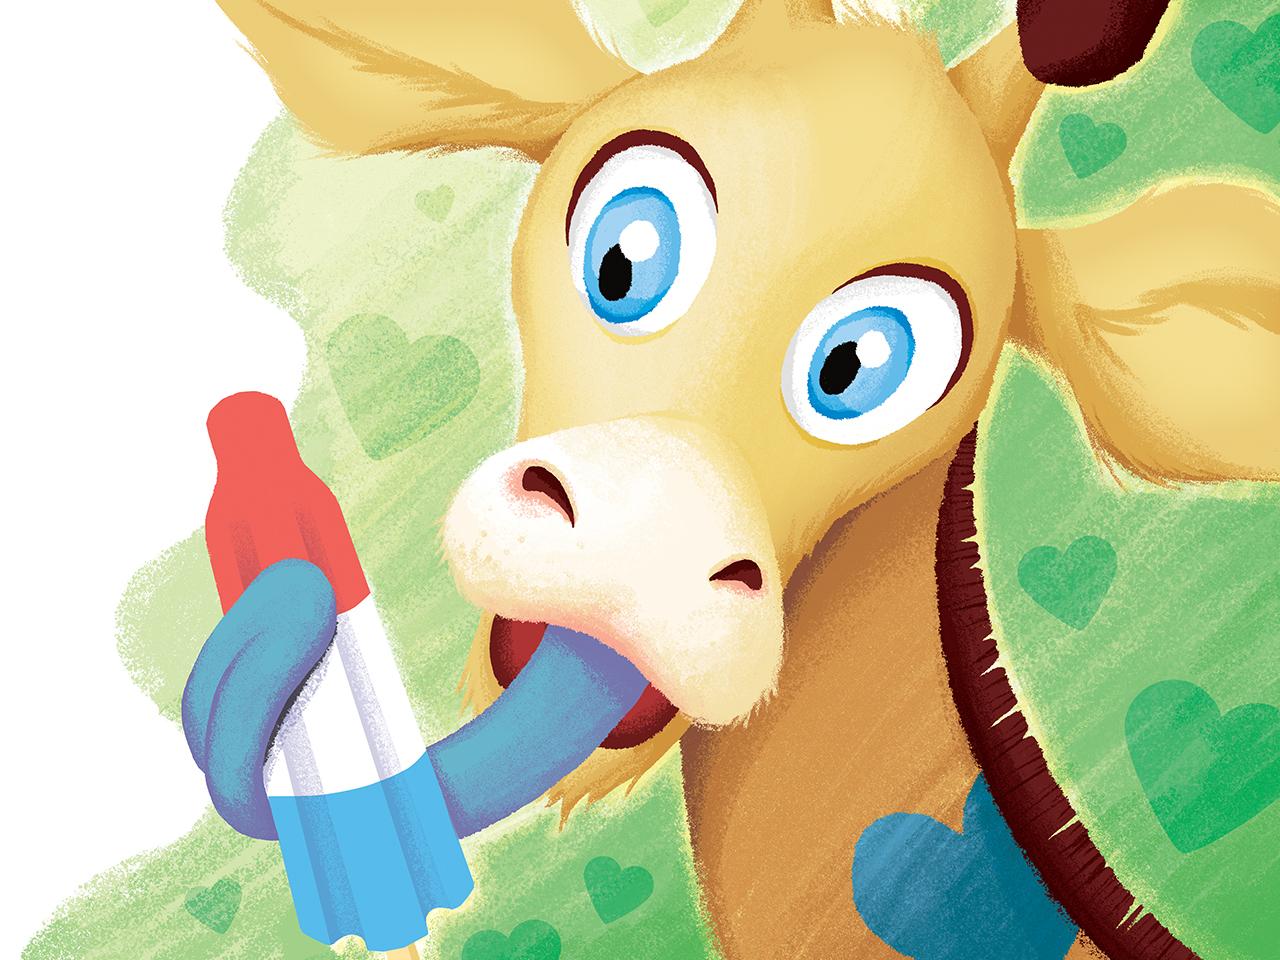 Giraffe Bomb bomb giraffe fun illustration children book popcicle